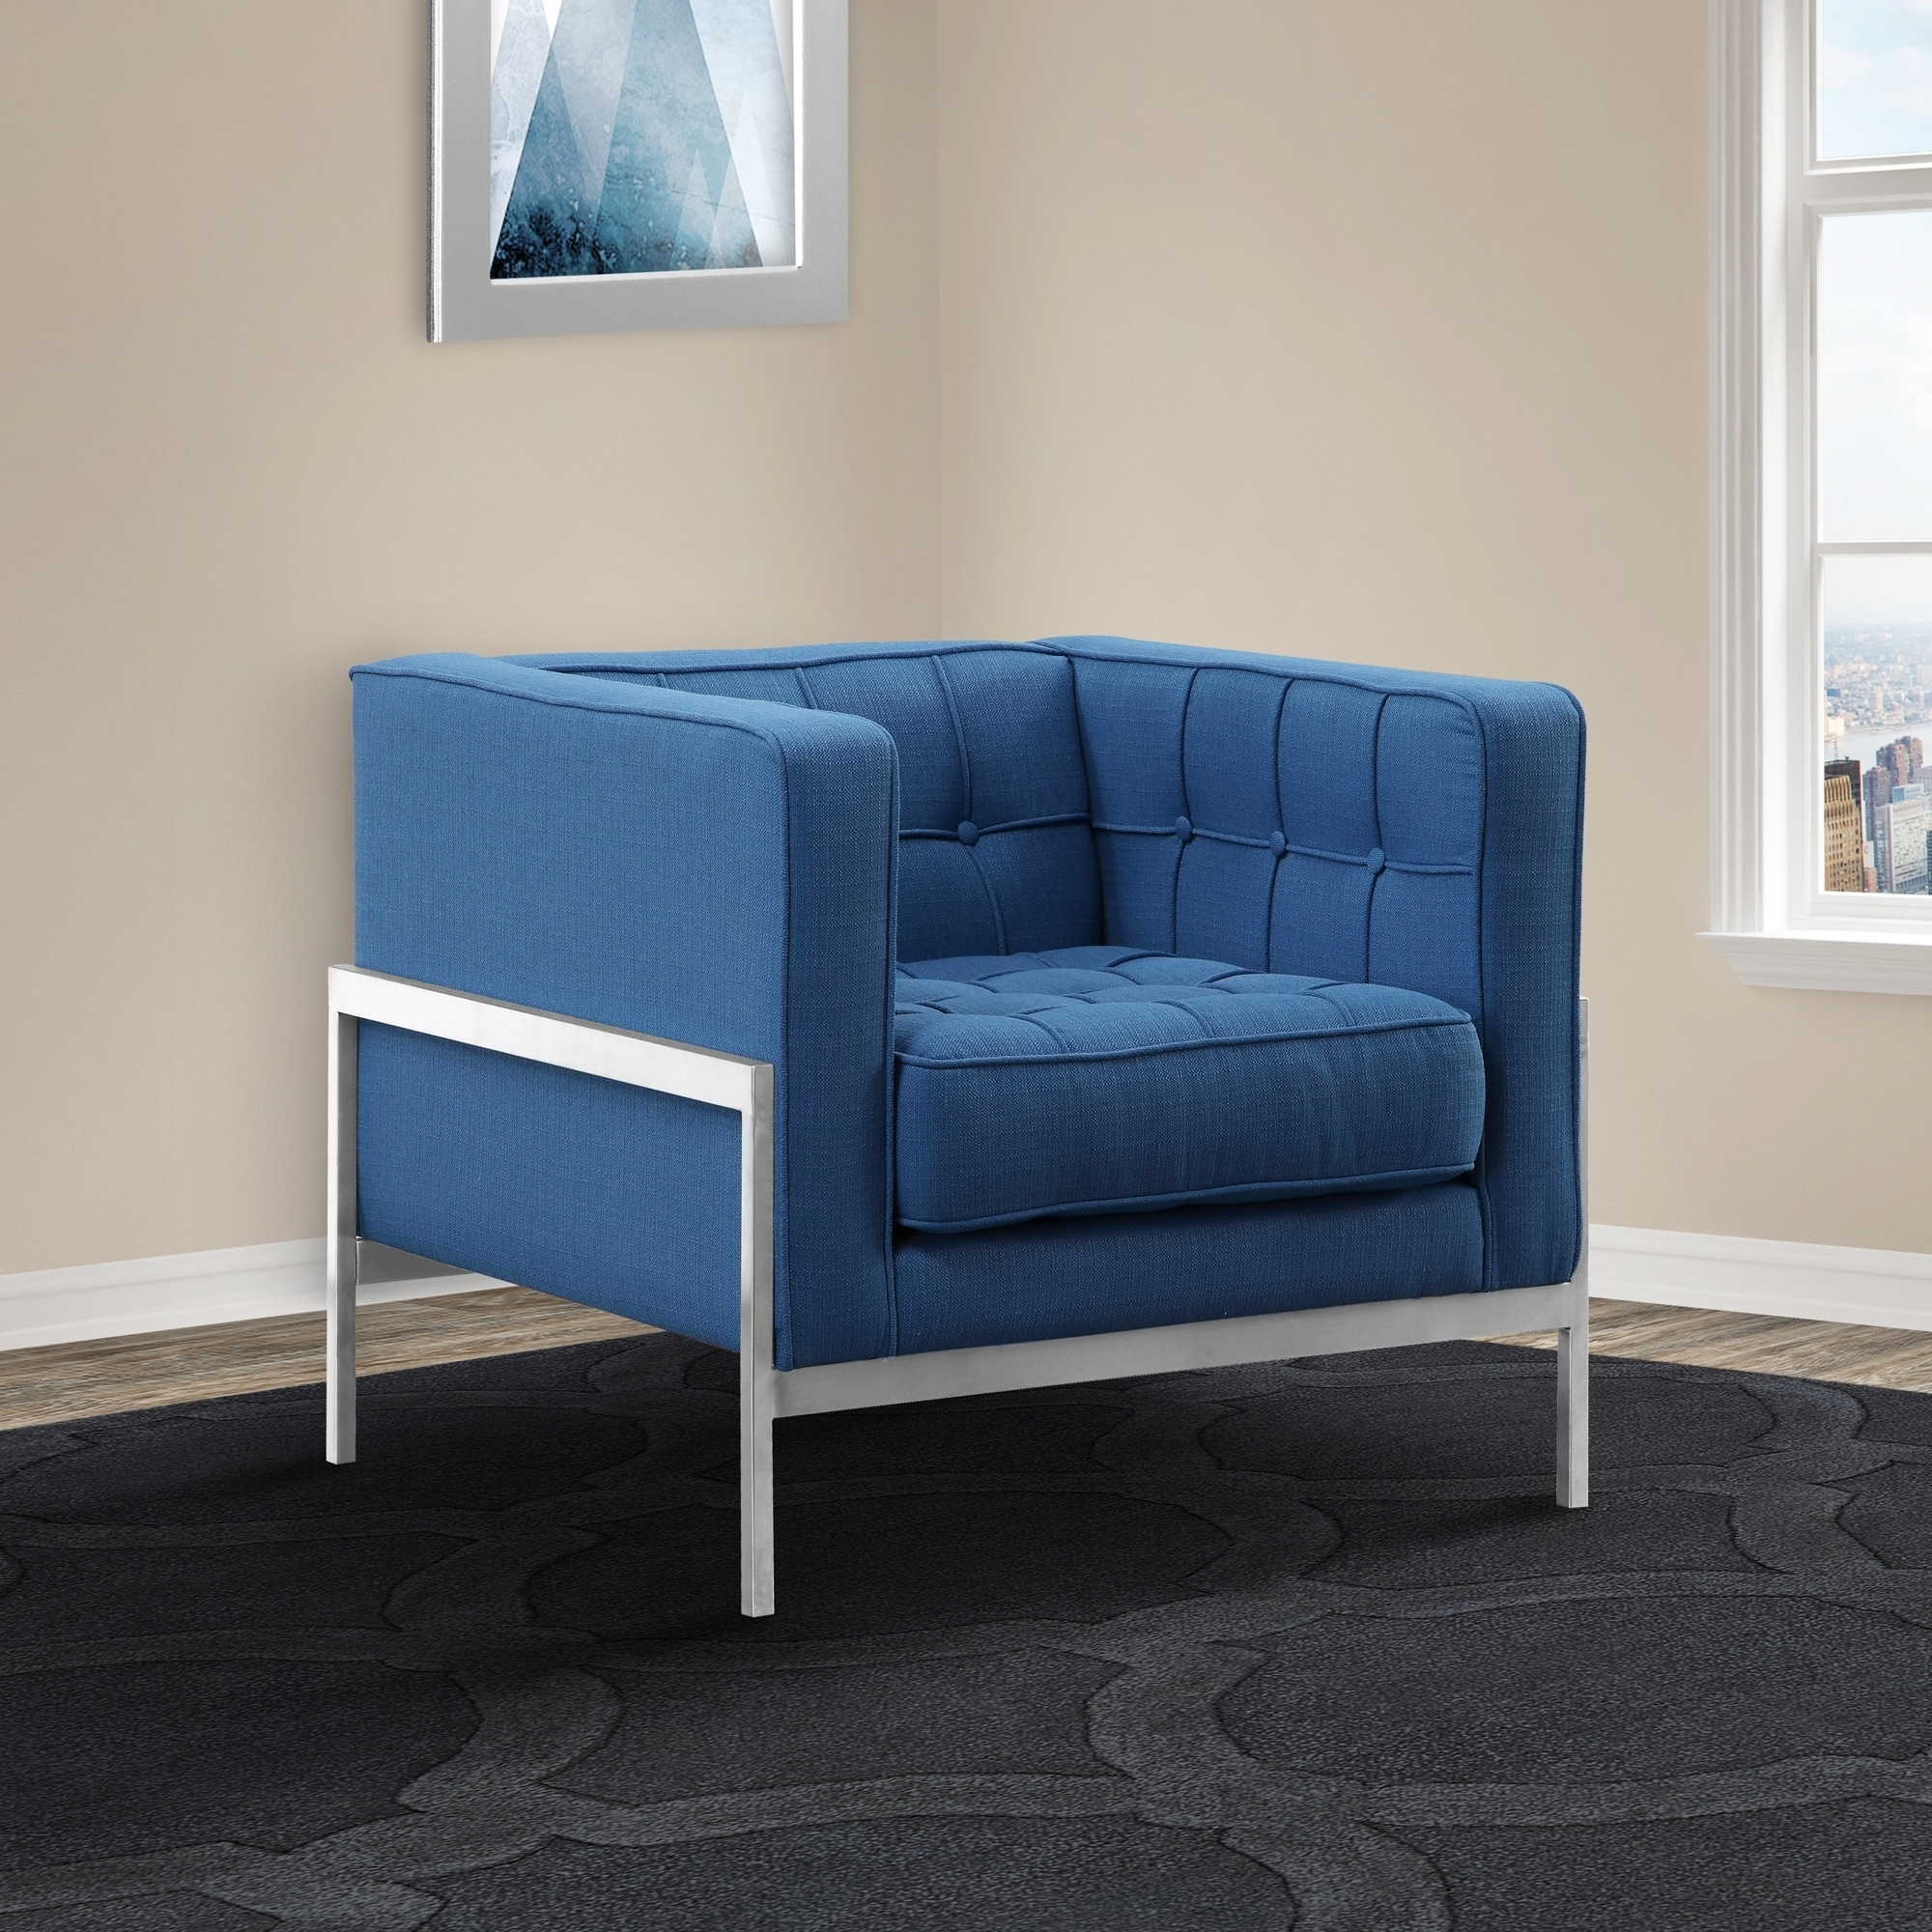 andre sofa natuzzi vittoria off white italian leather  home decor 88